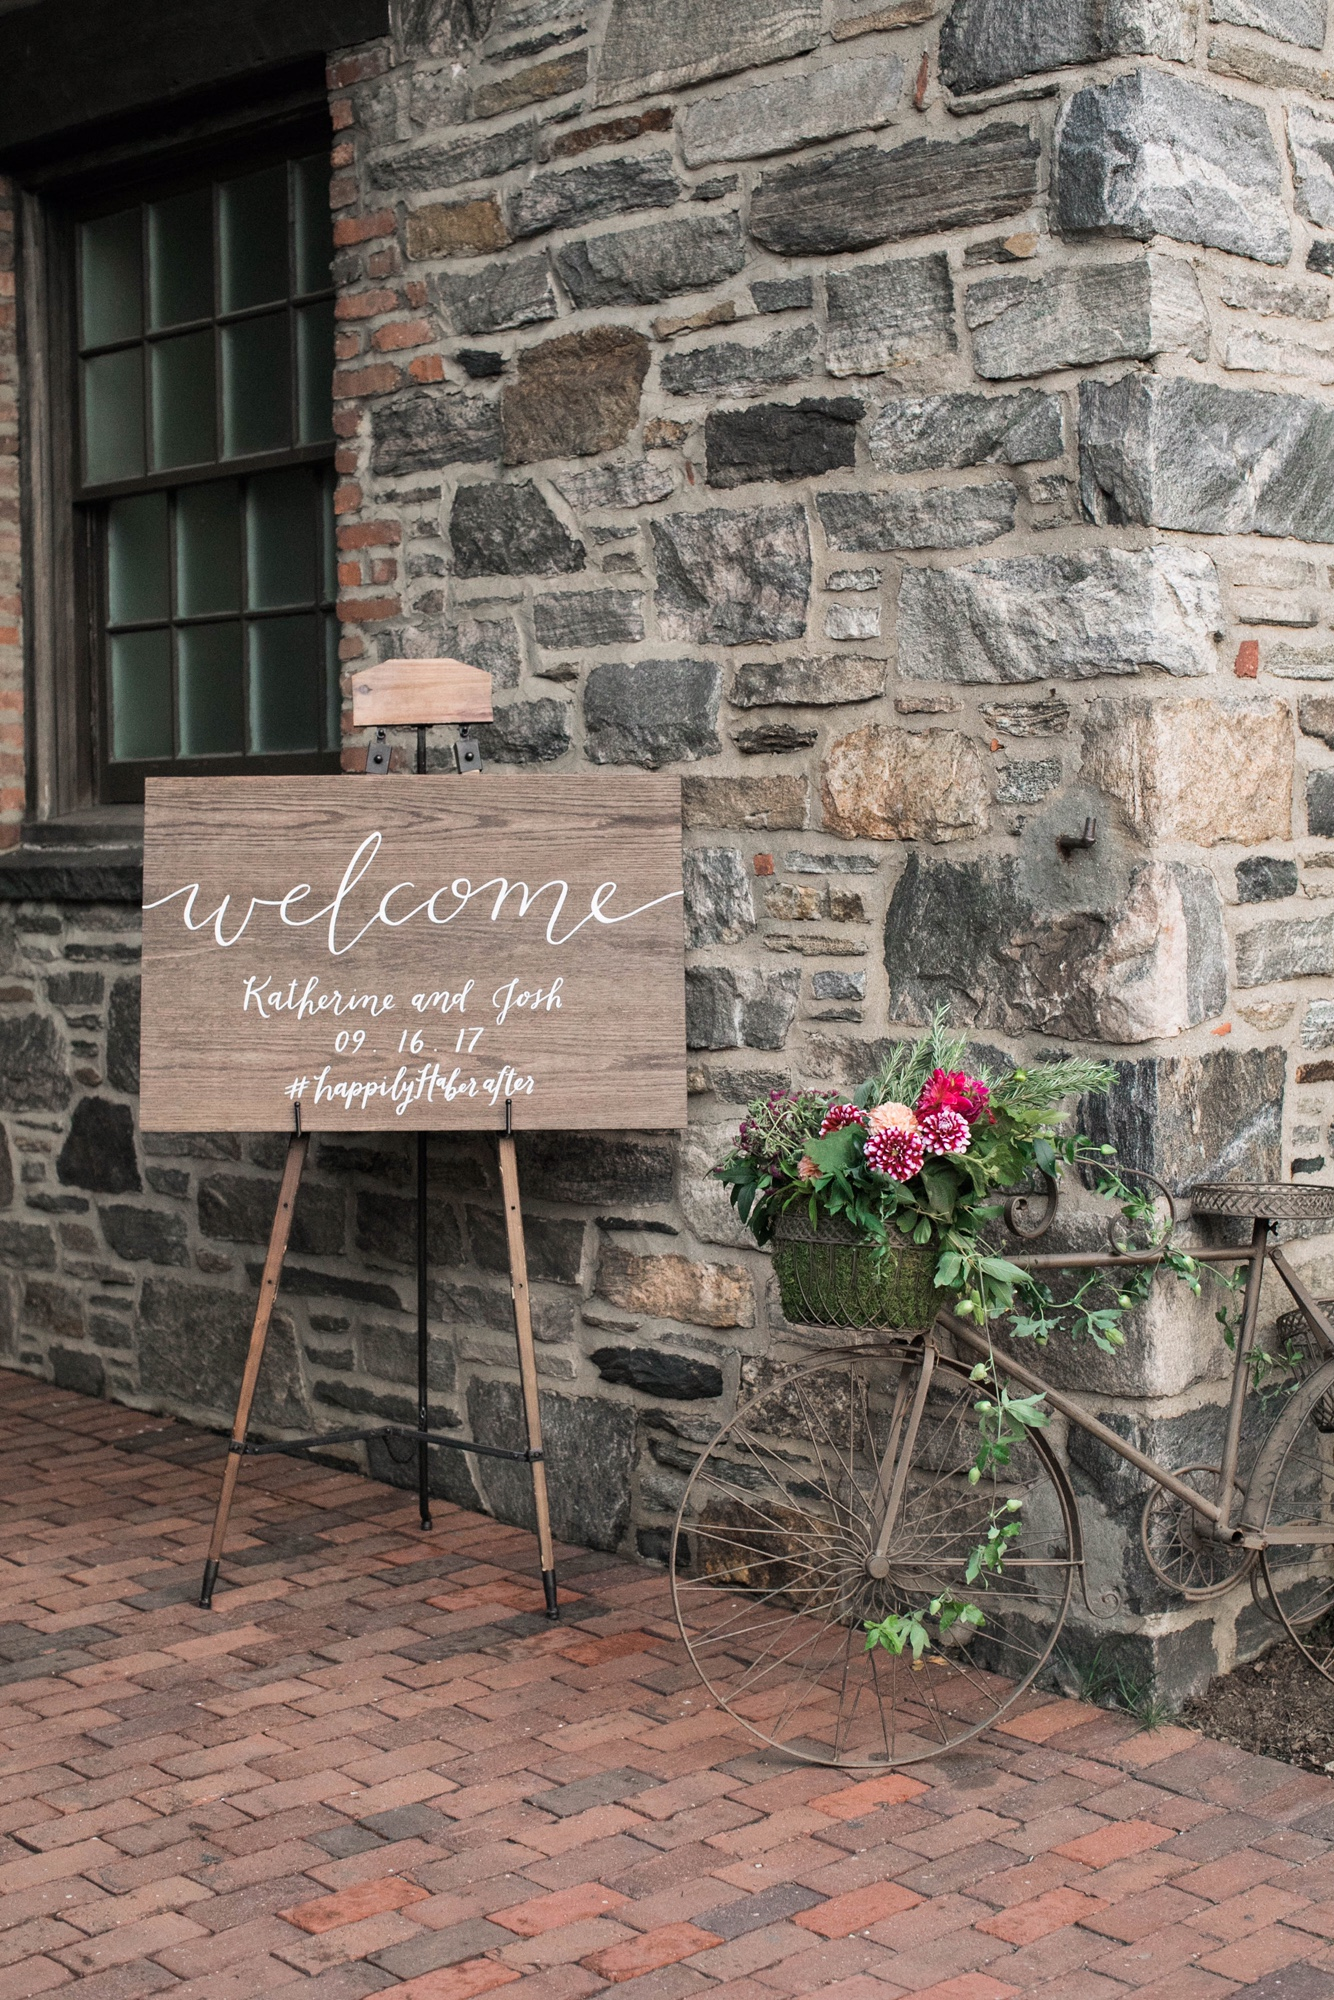 Elegant Affair Wedding at the Farm - Flowers by Denise Fasanello Flowers - Photos by Meg Miller 10.JPG